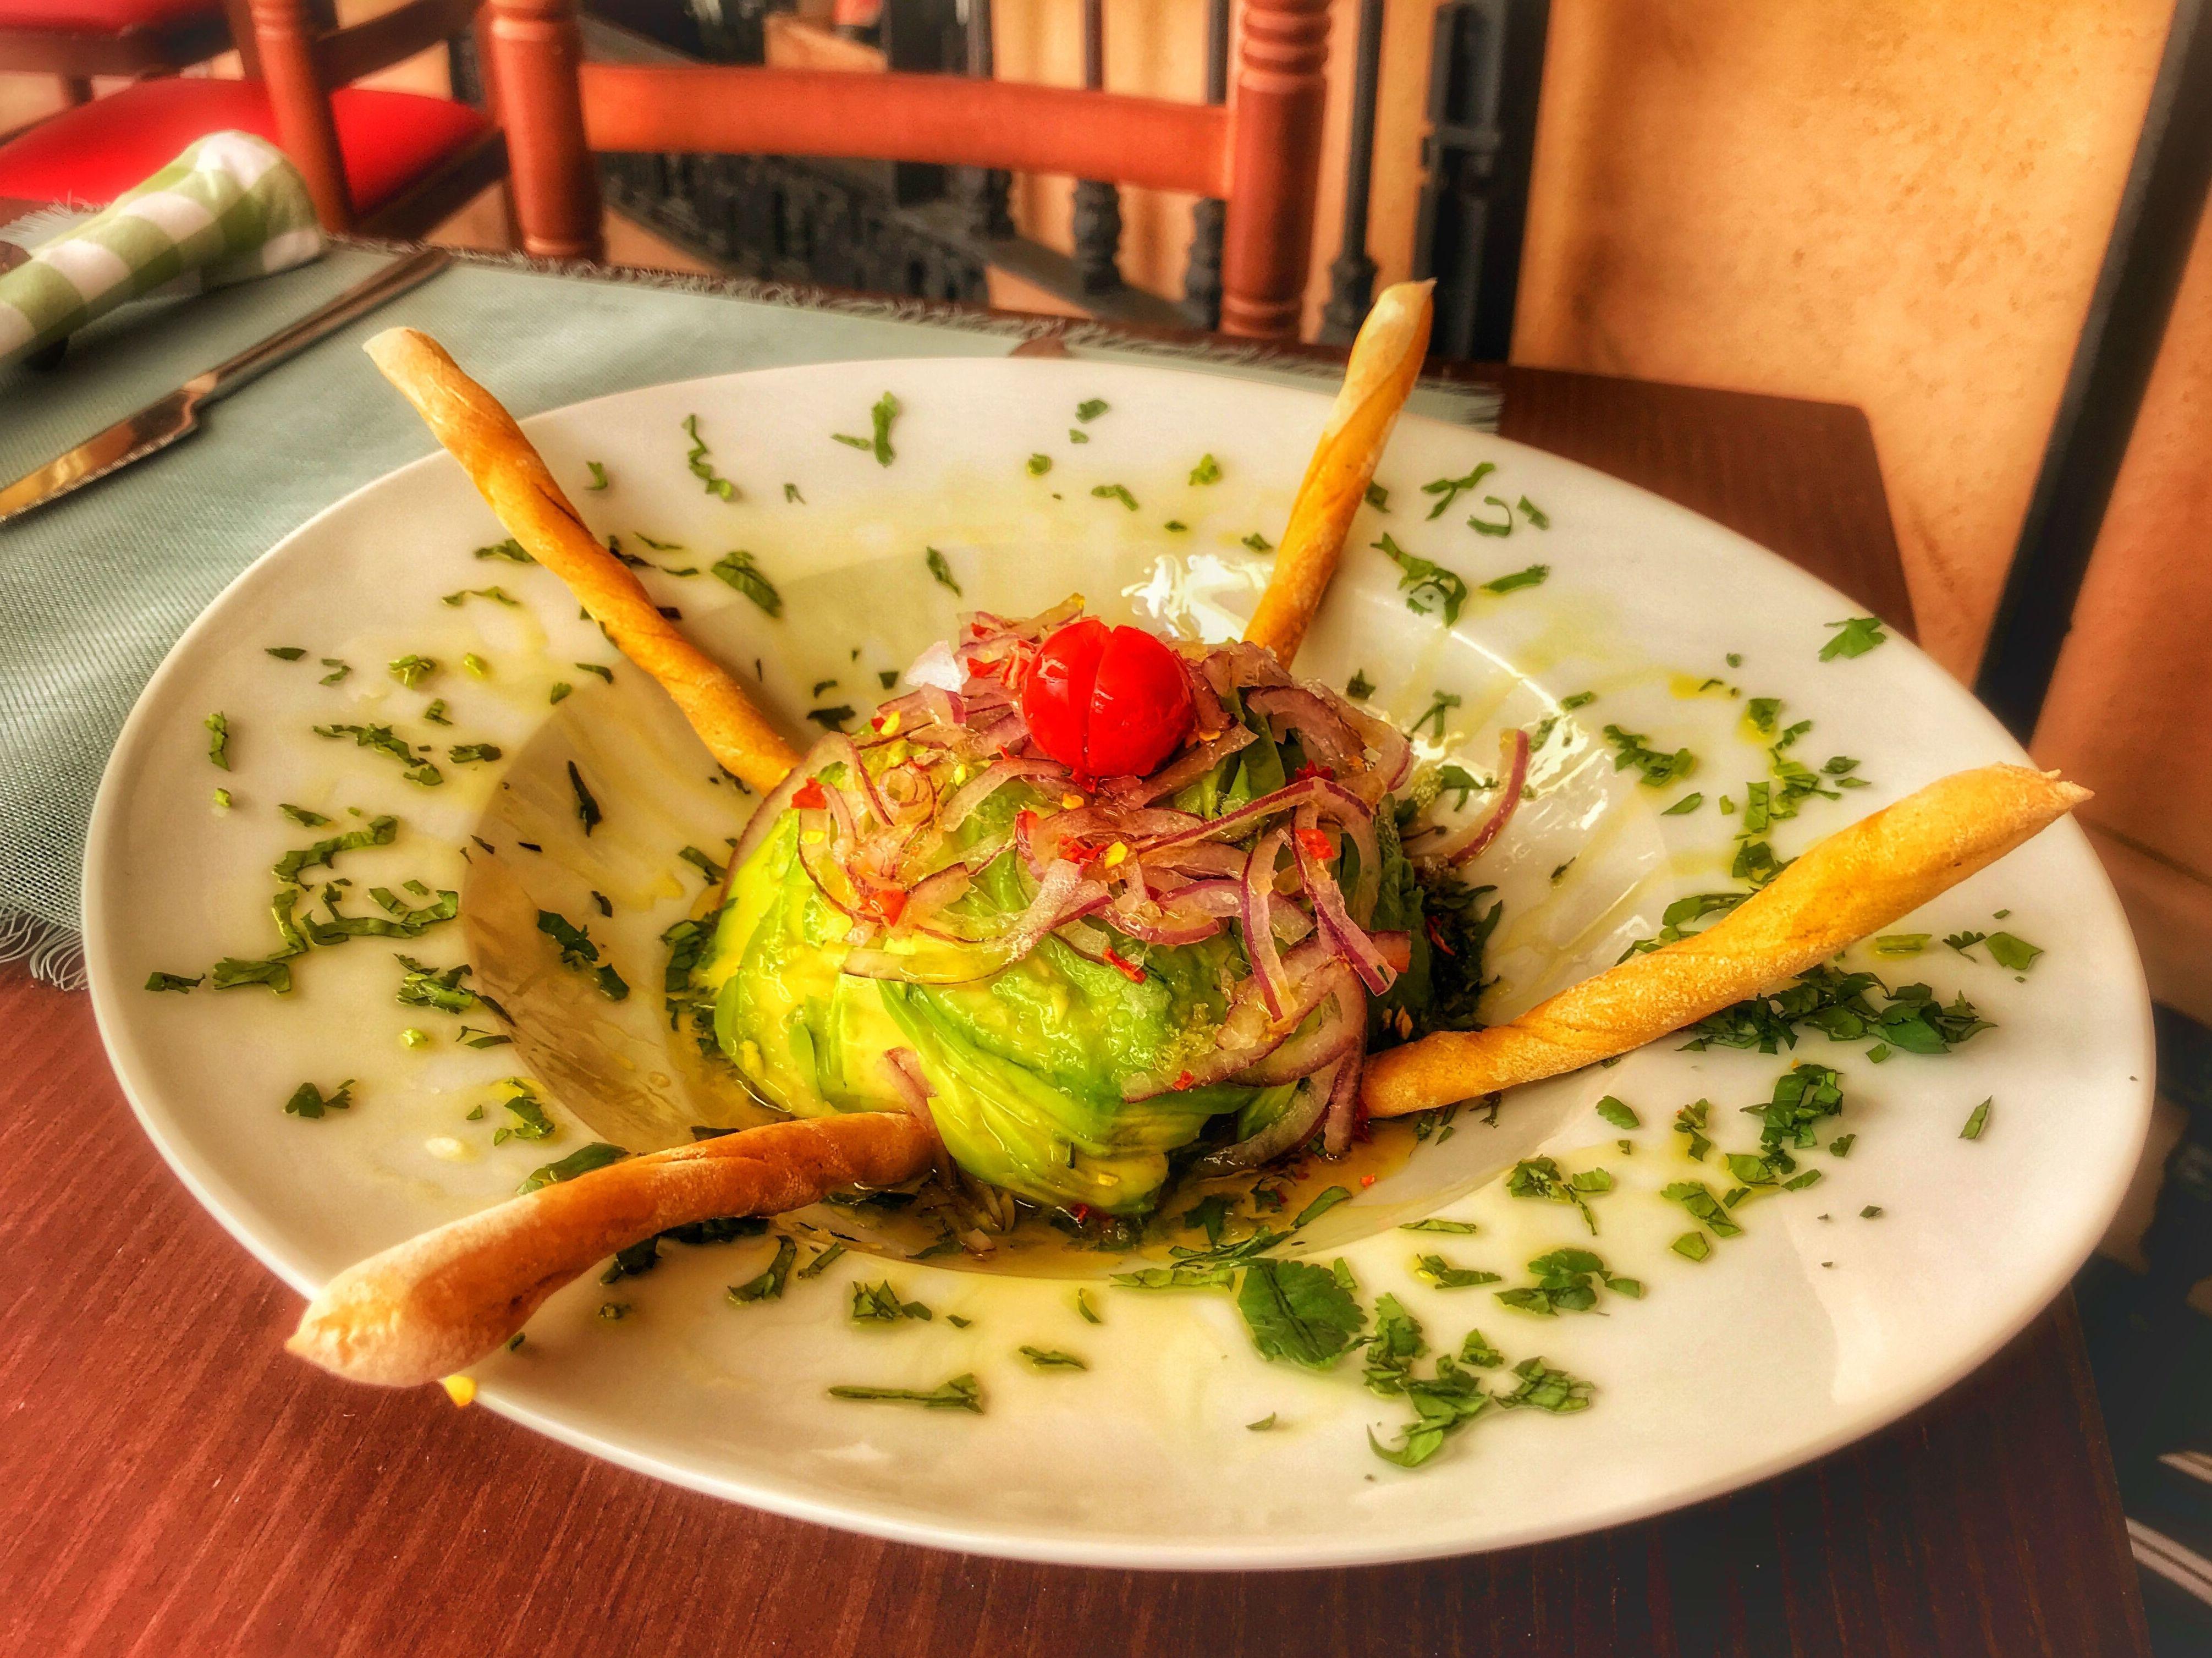 Foto 7 de Restaurante en Málaga   Ocho